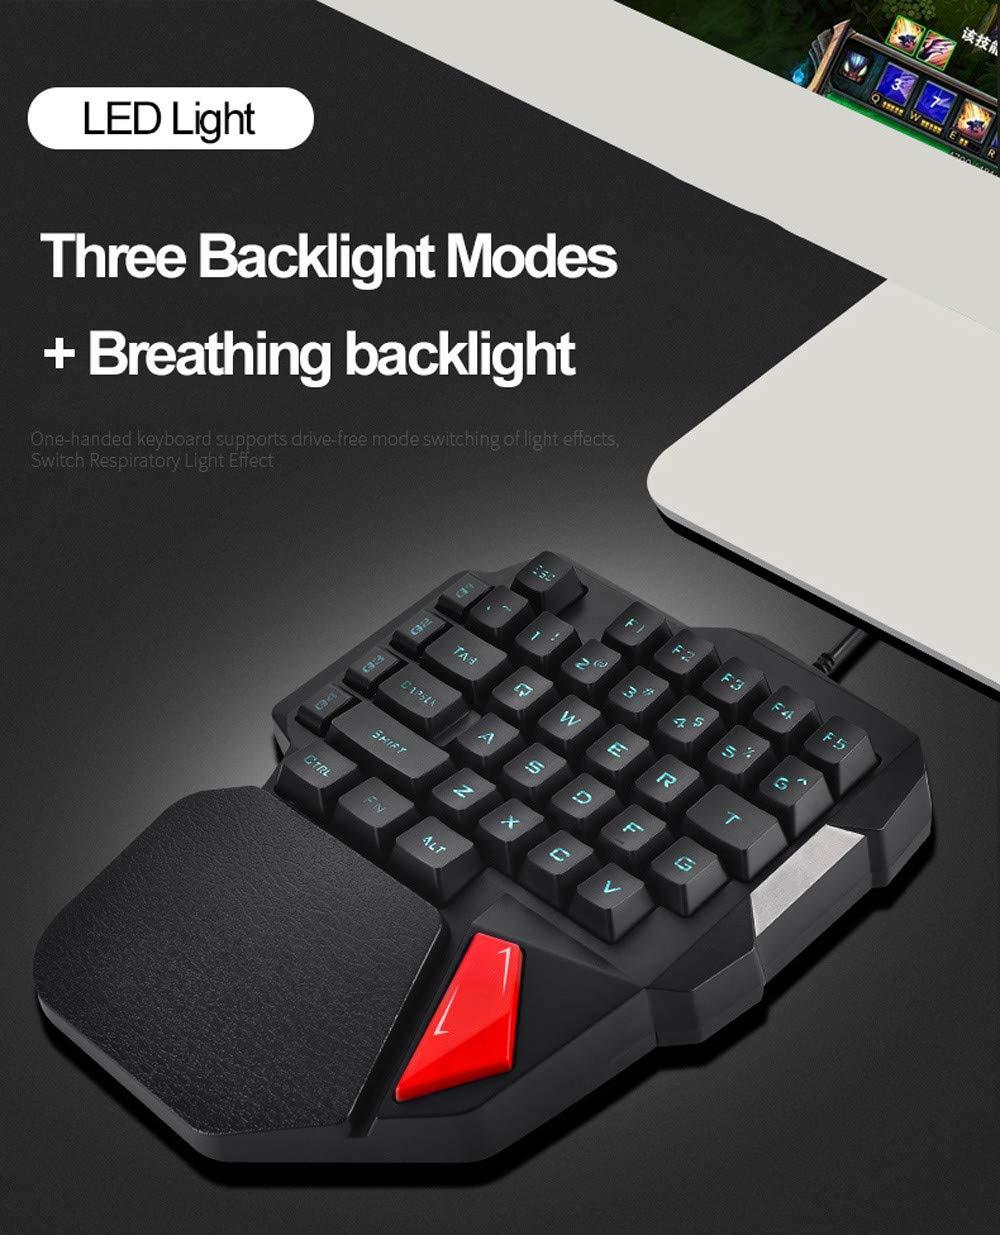 Hisoul One-Handed Gaming Keyboard, K108 Wired 38 Keys LED Backlit USB Ergonomic Gaming Keyboard for PUBG CNF and LOL Gamer (Black) by Hisoul (Image #5)